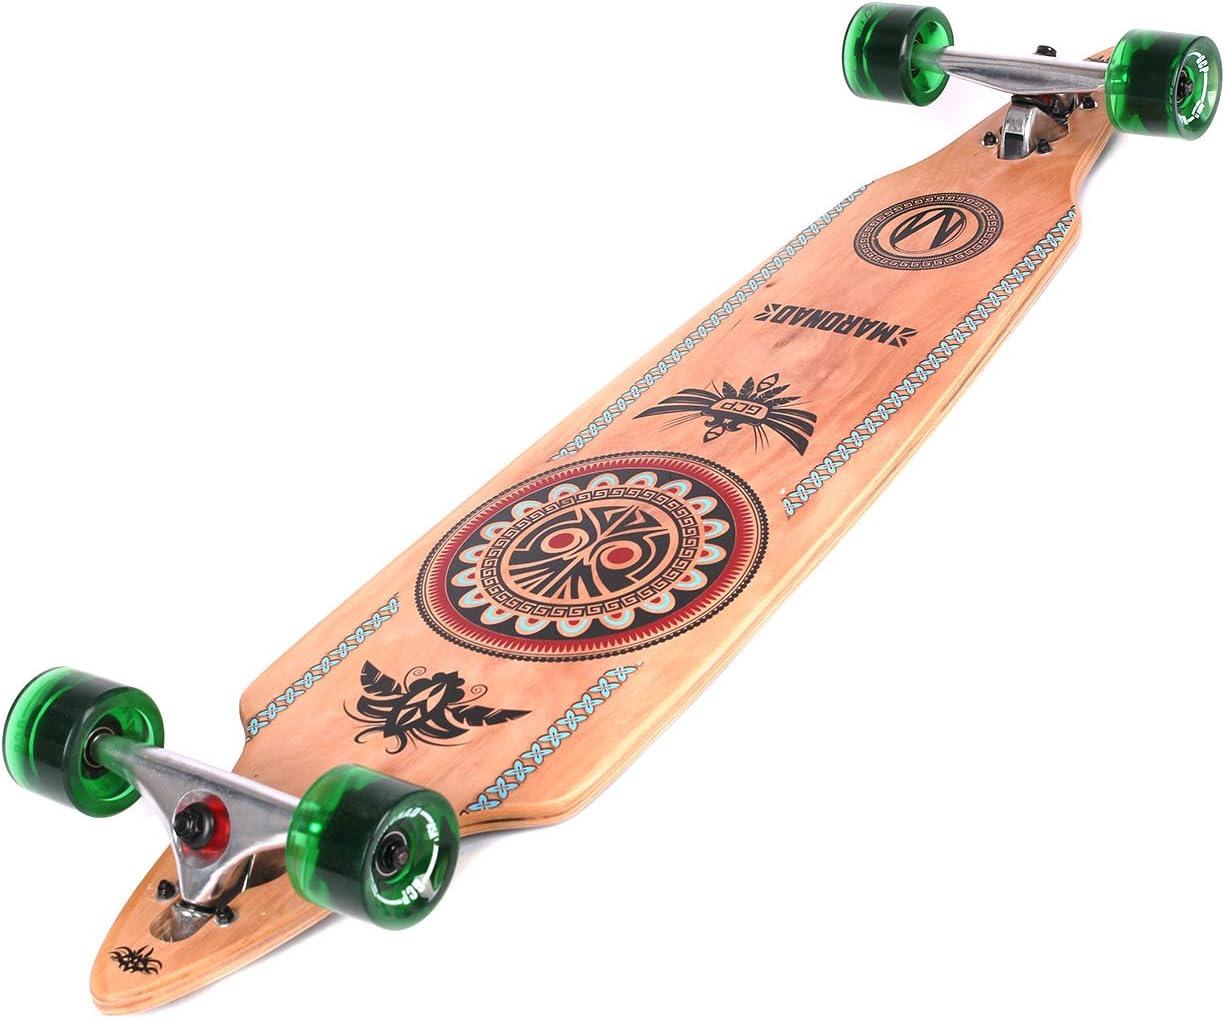 Skateboard Longboard Maronad pour du skate de rue fun Drop Through Race Cruiser ABEC/11 104/x/24/cm